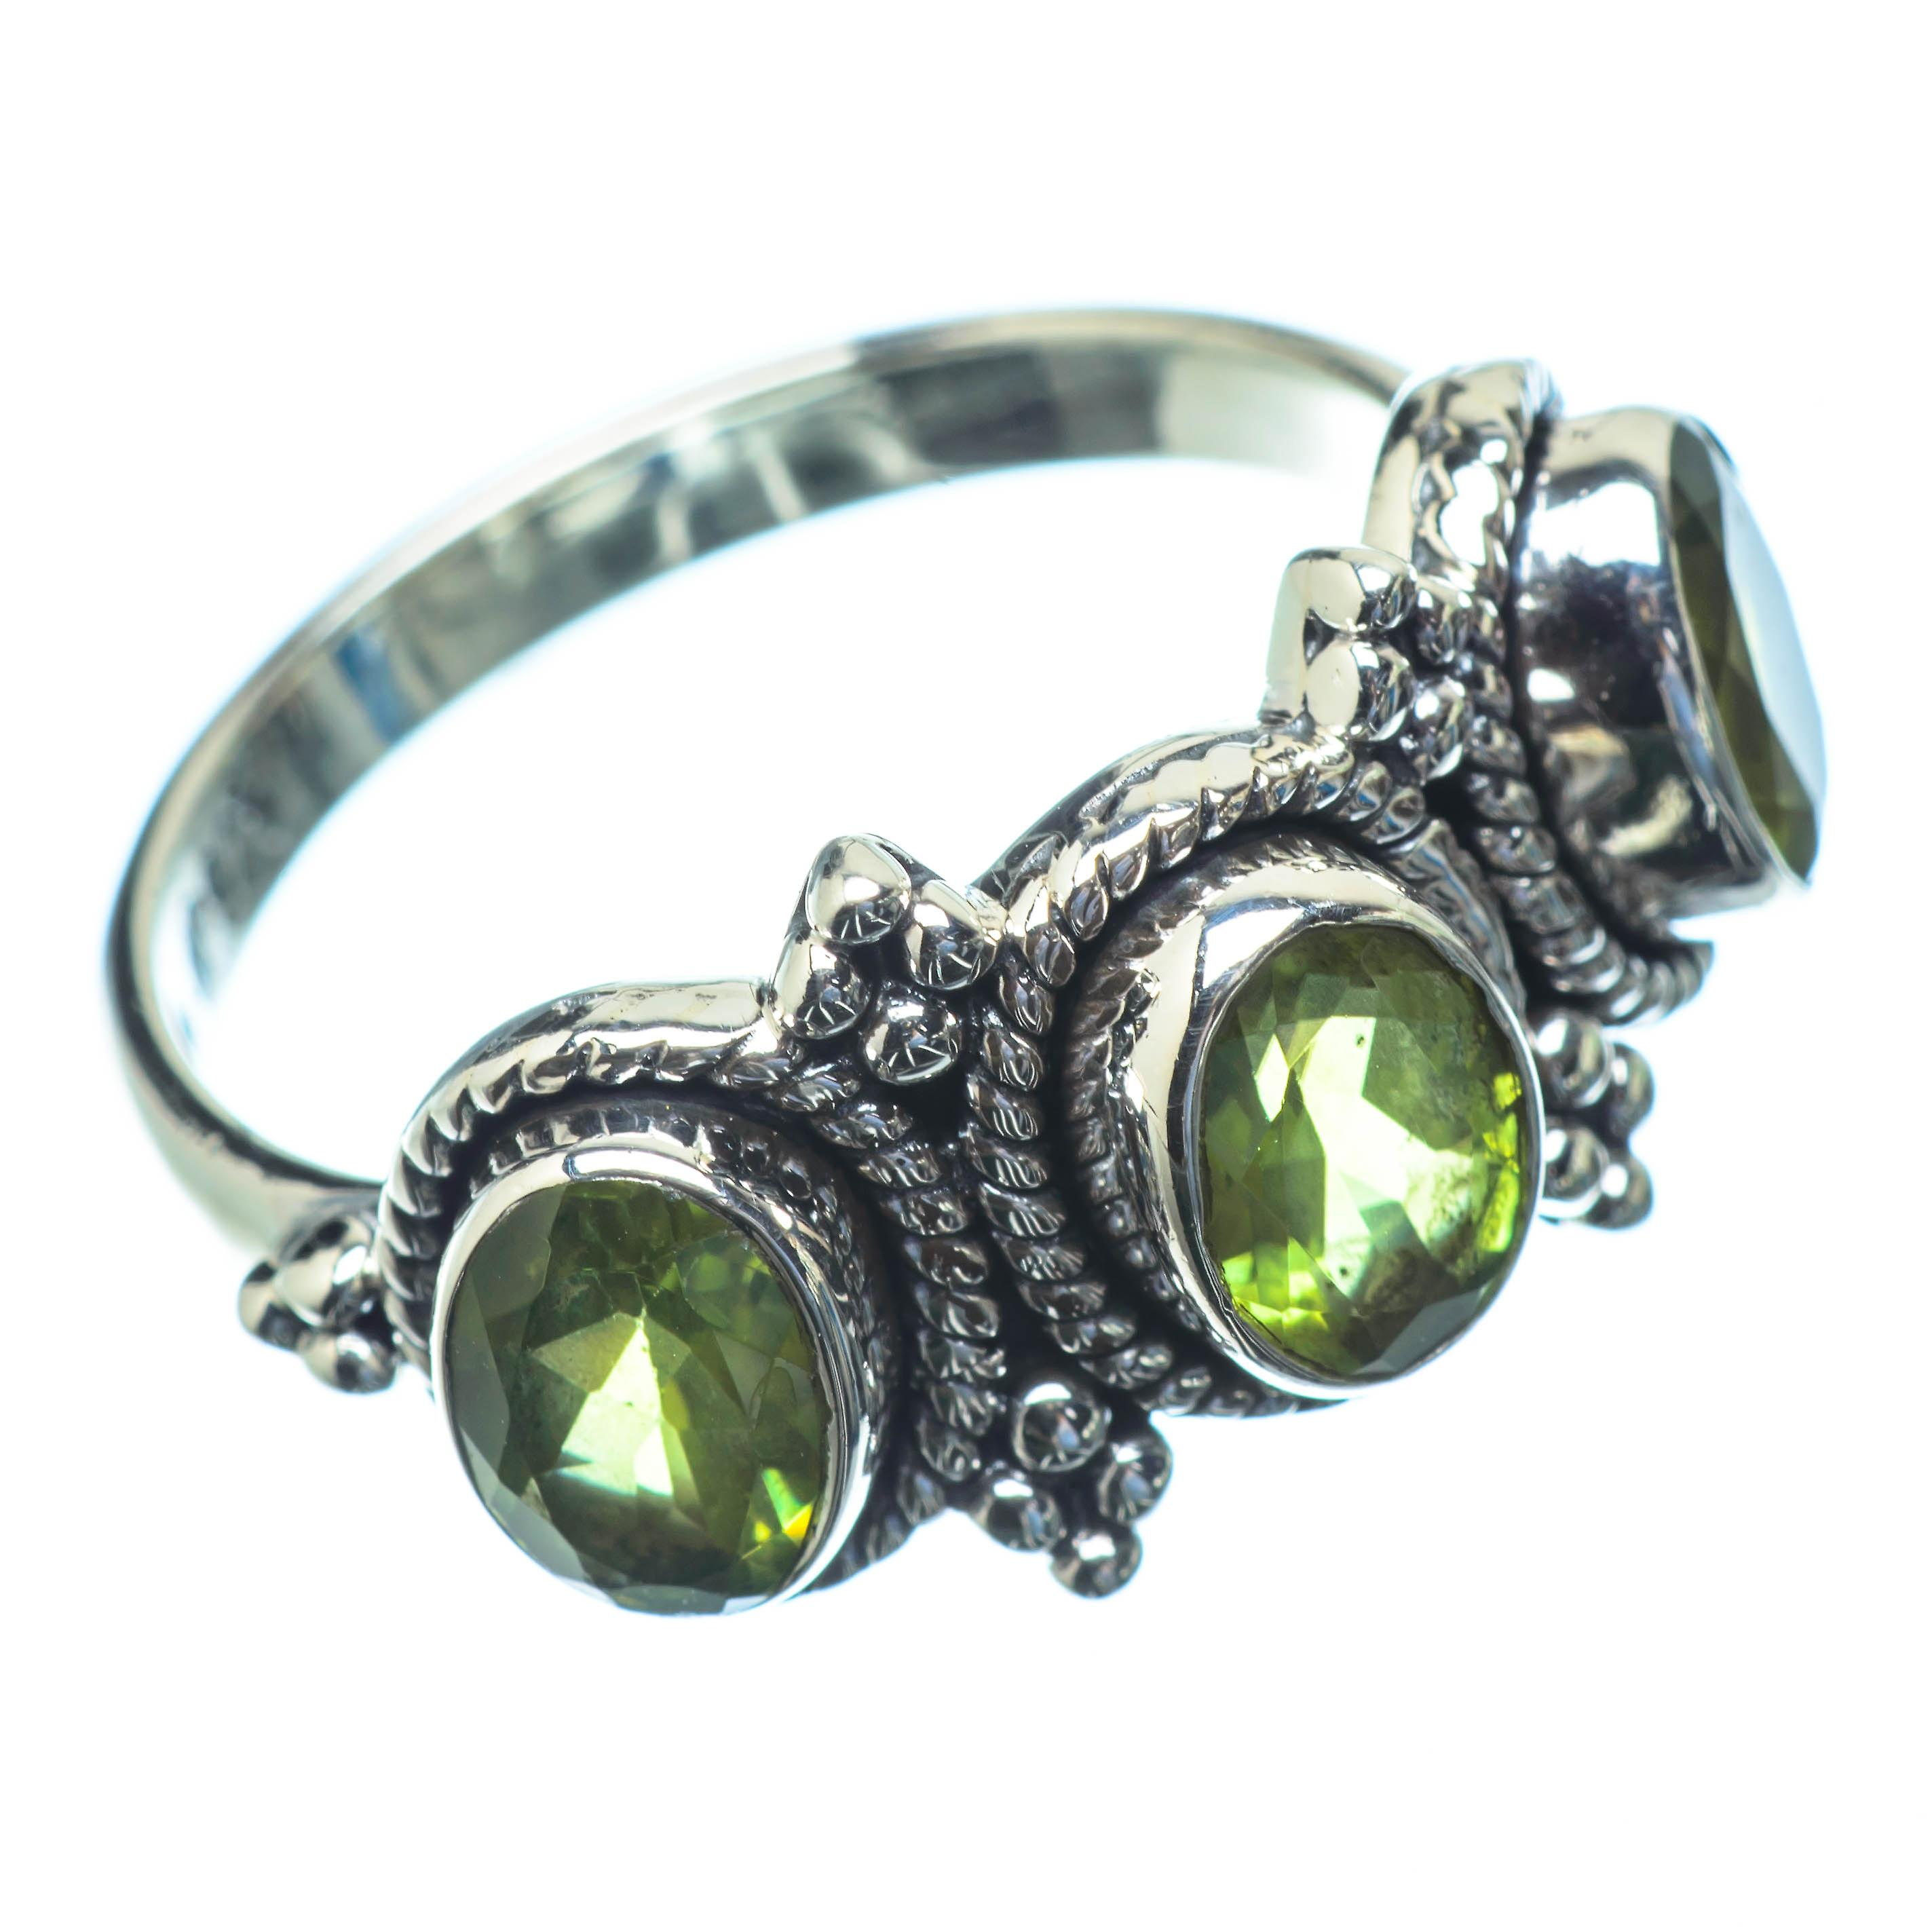 Hochwertige Günstige Fantastisk pris Peridot Ring Size 8.5 (925 Sterling Silver)  - Handmade Boho Vintage Jewelry RING25665 aFxUK